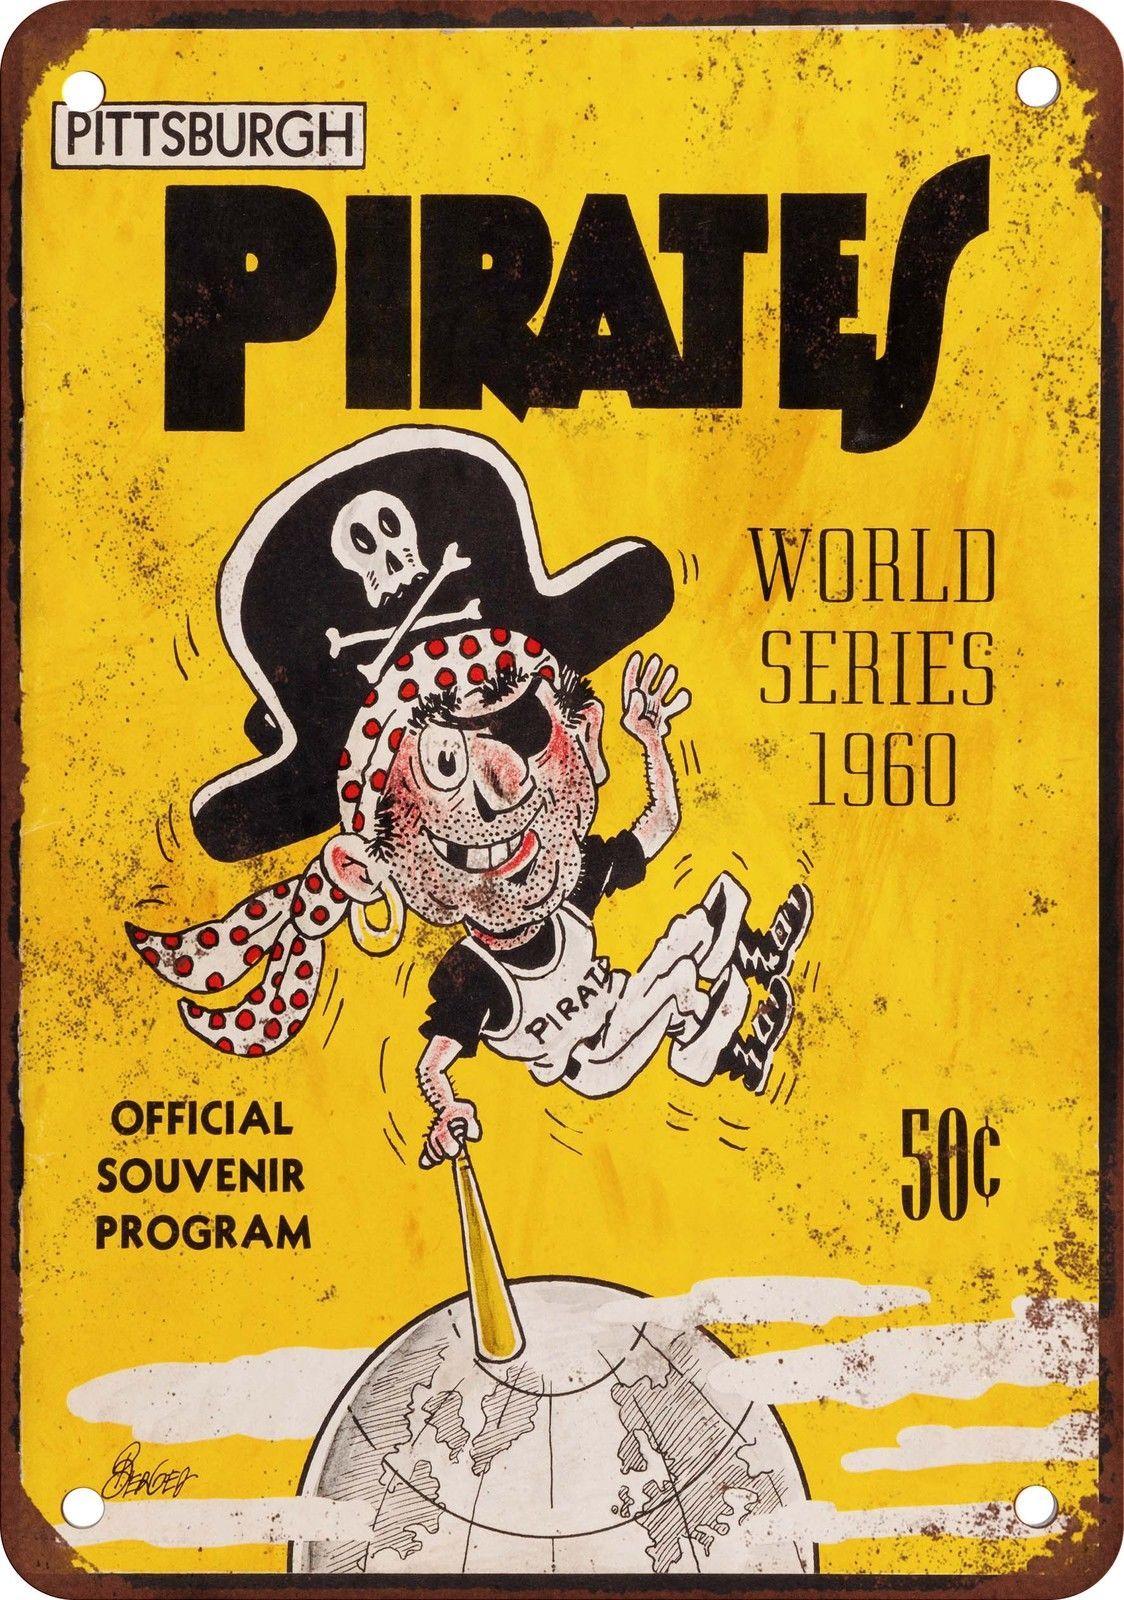 1960 World Series Pirates vs Yankees Vintage Look Reproduction Metal ...